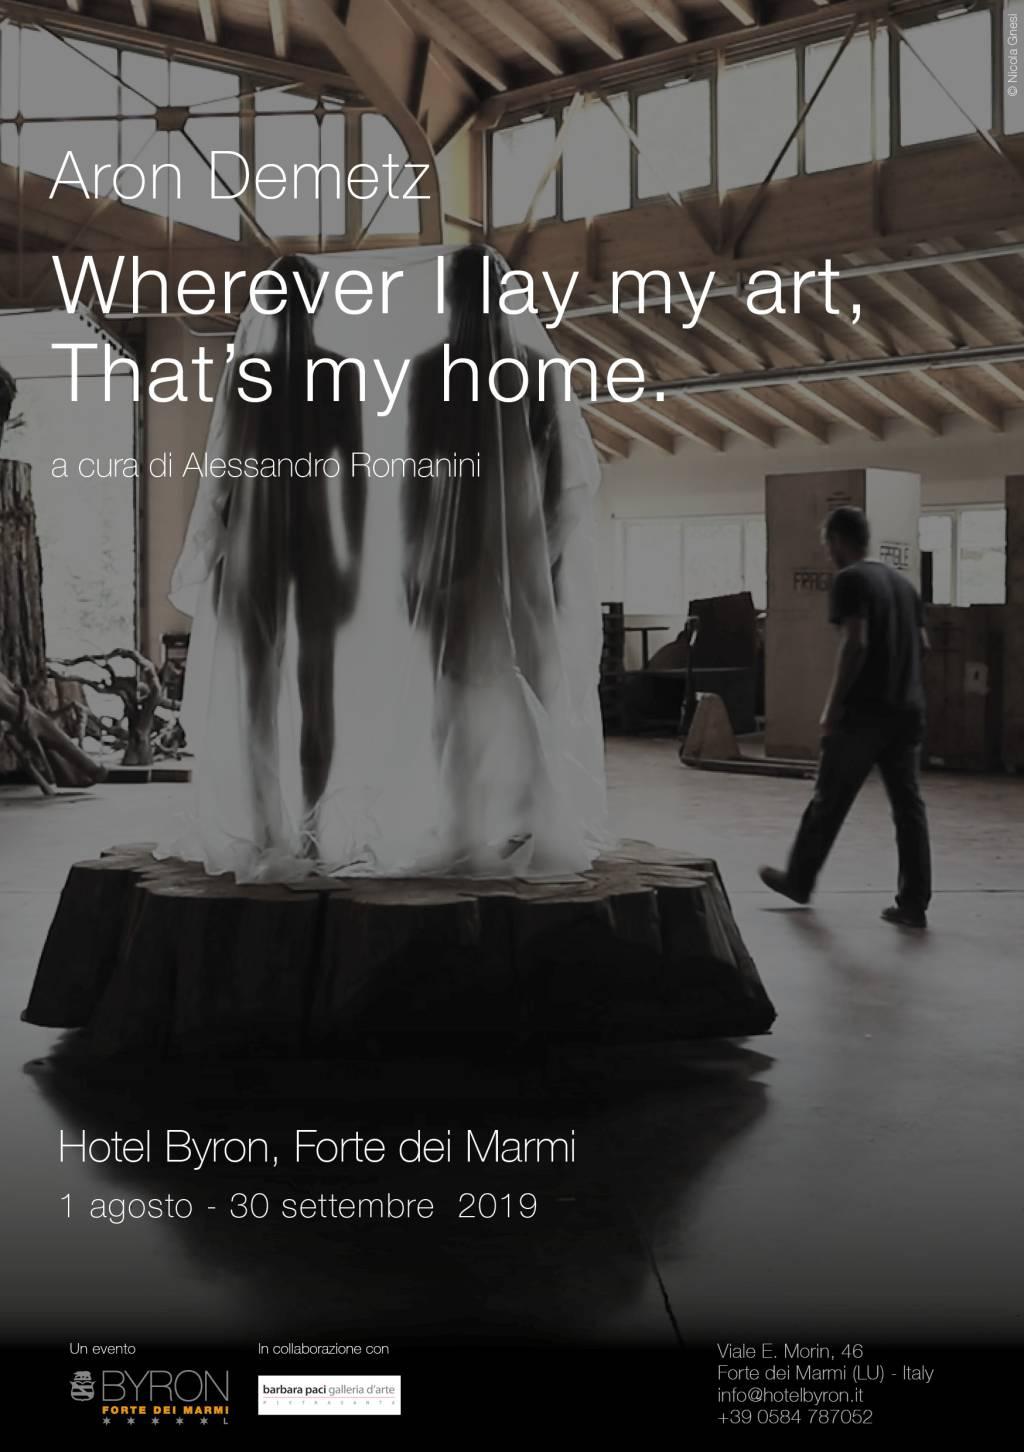 Aron Demetz - Hotel Byron - Forte dei Marmi | Agosto - Settembre 2019